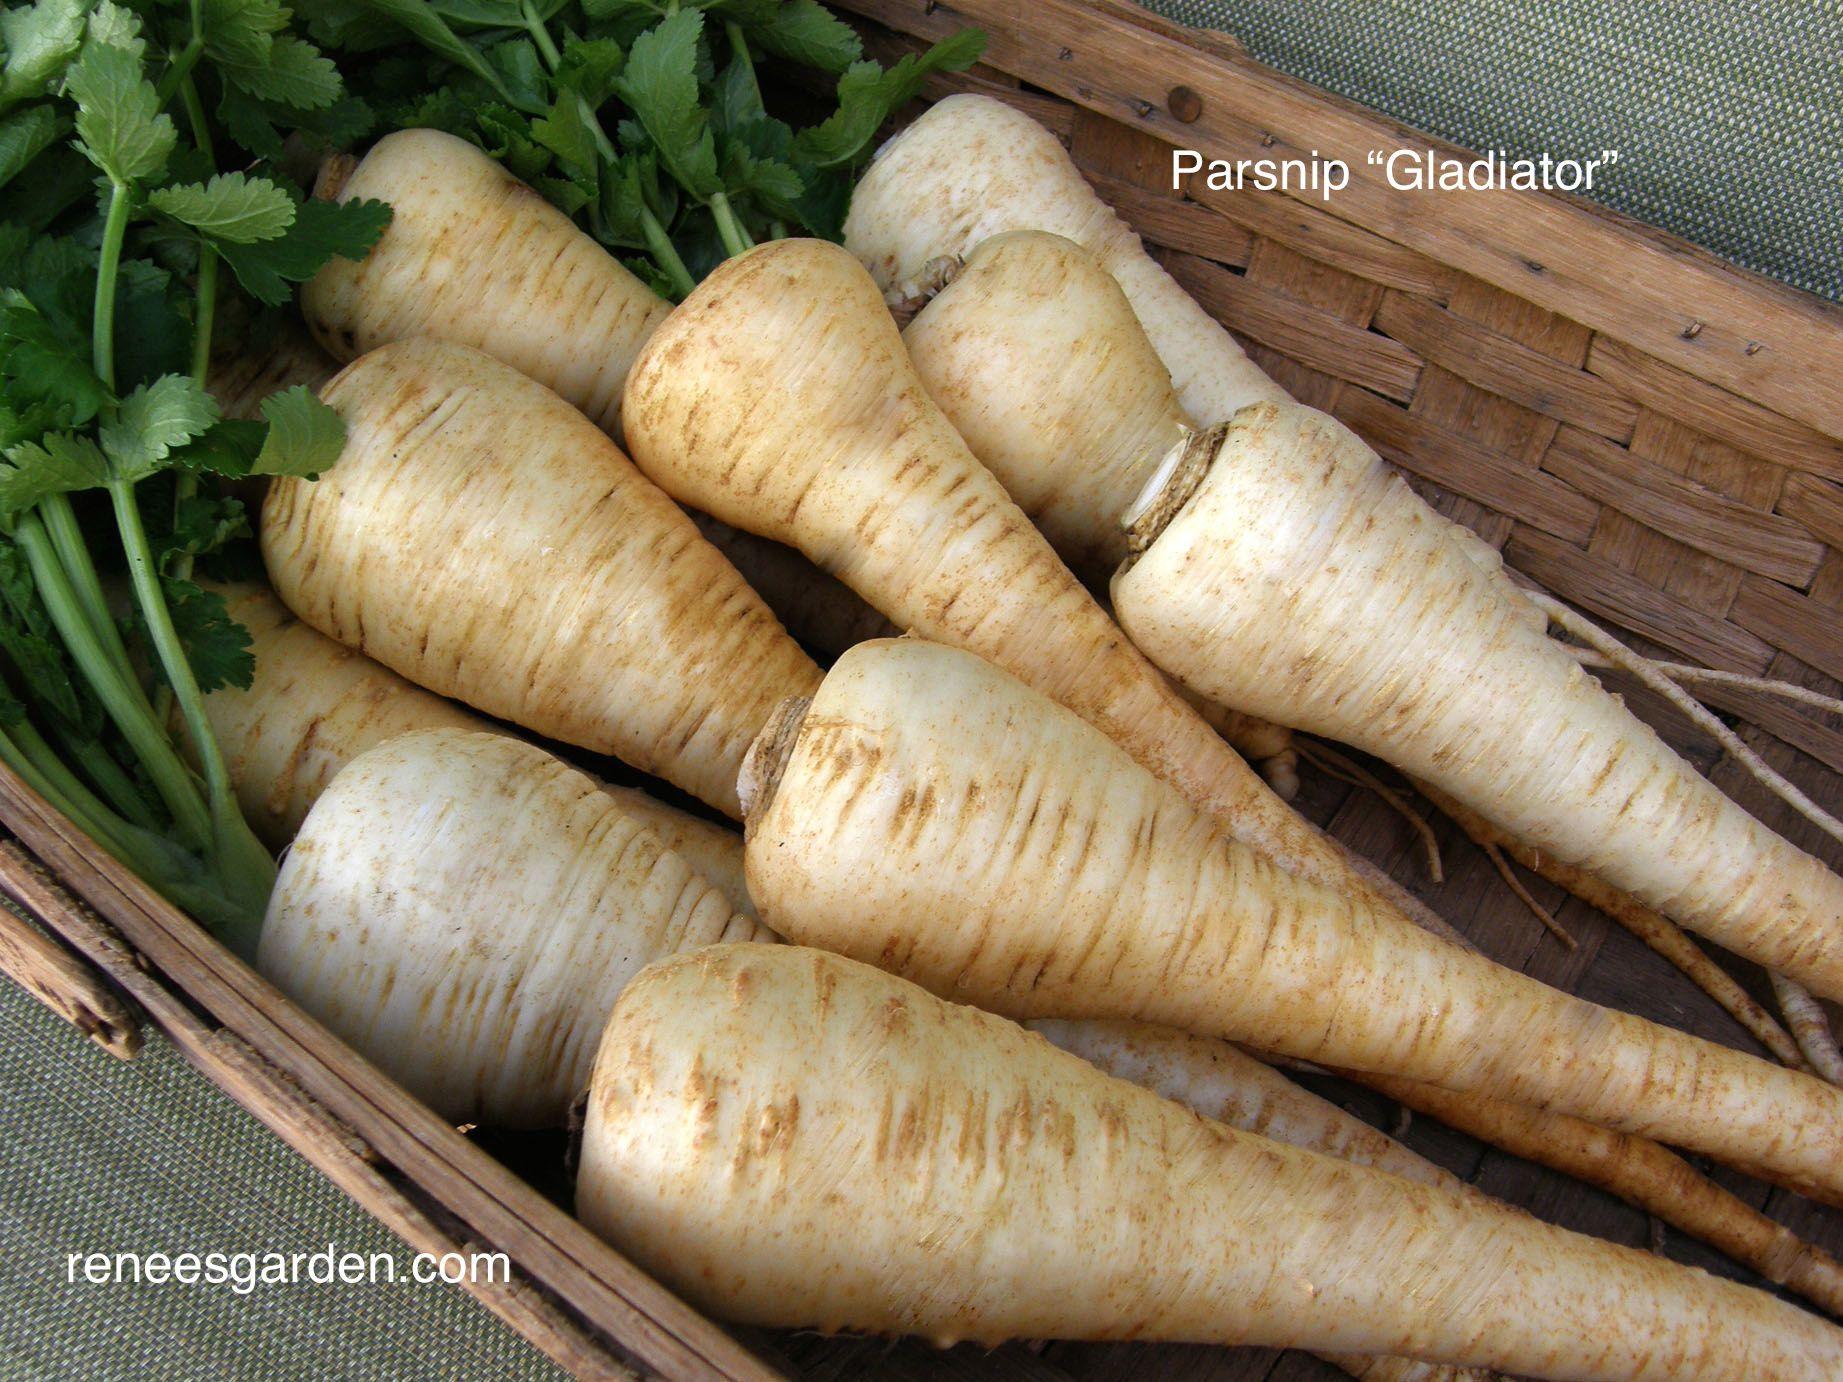 Gladiator | Pinterest | Garden pictures, Vegetable garden and Gardens